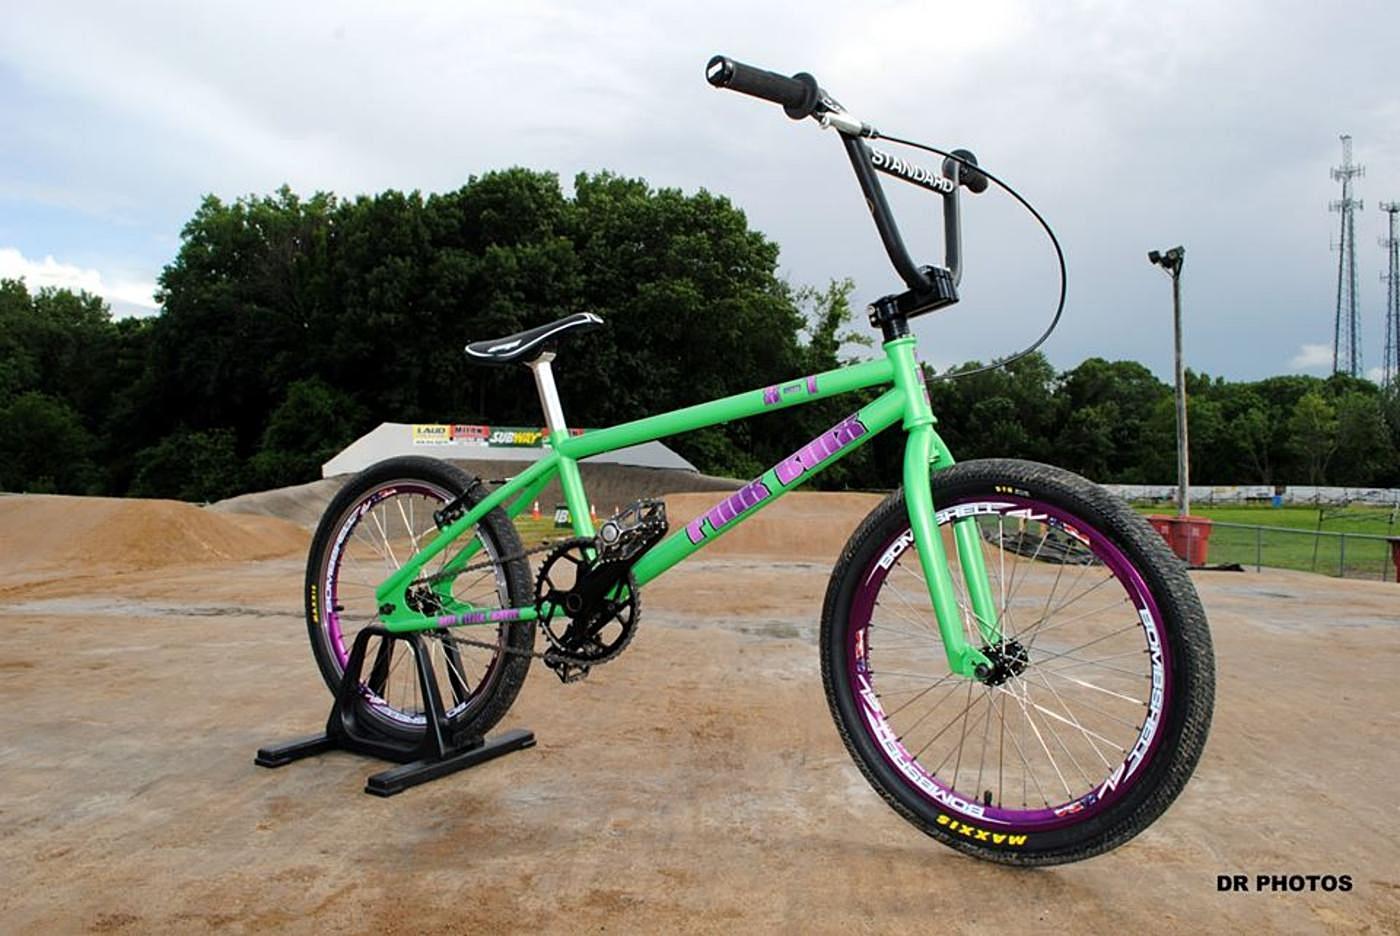 Standard FMRBMX bike